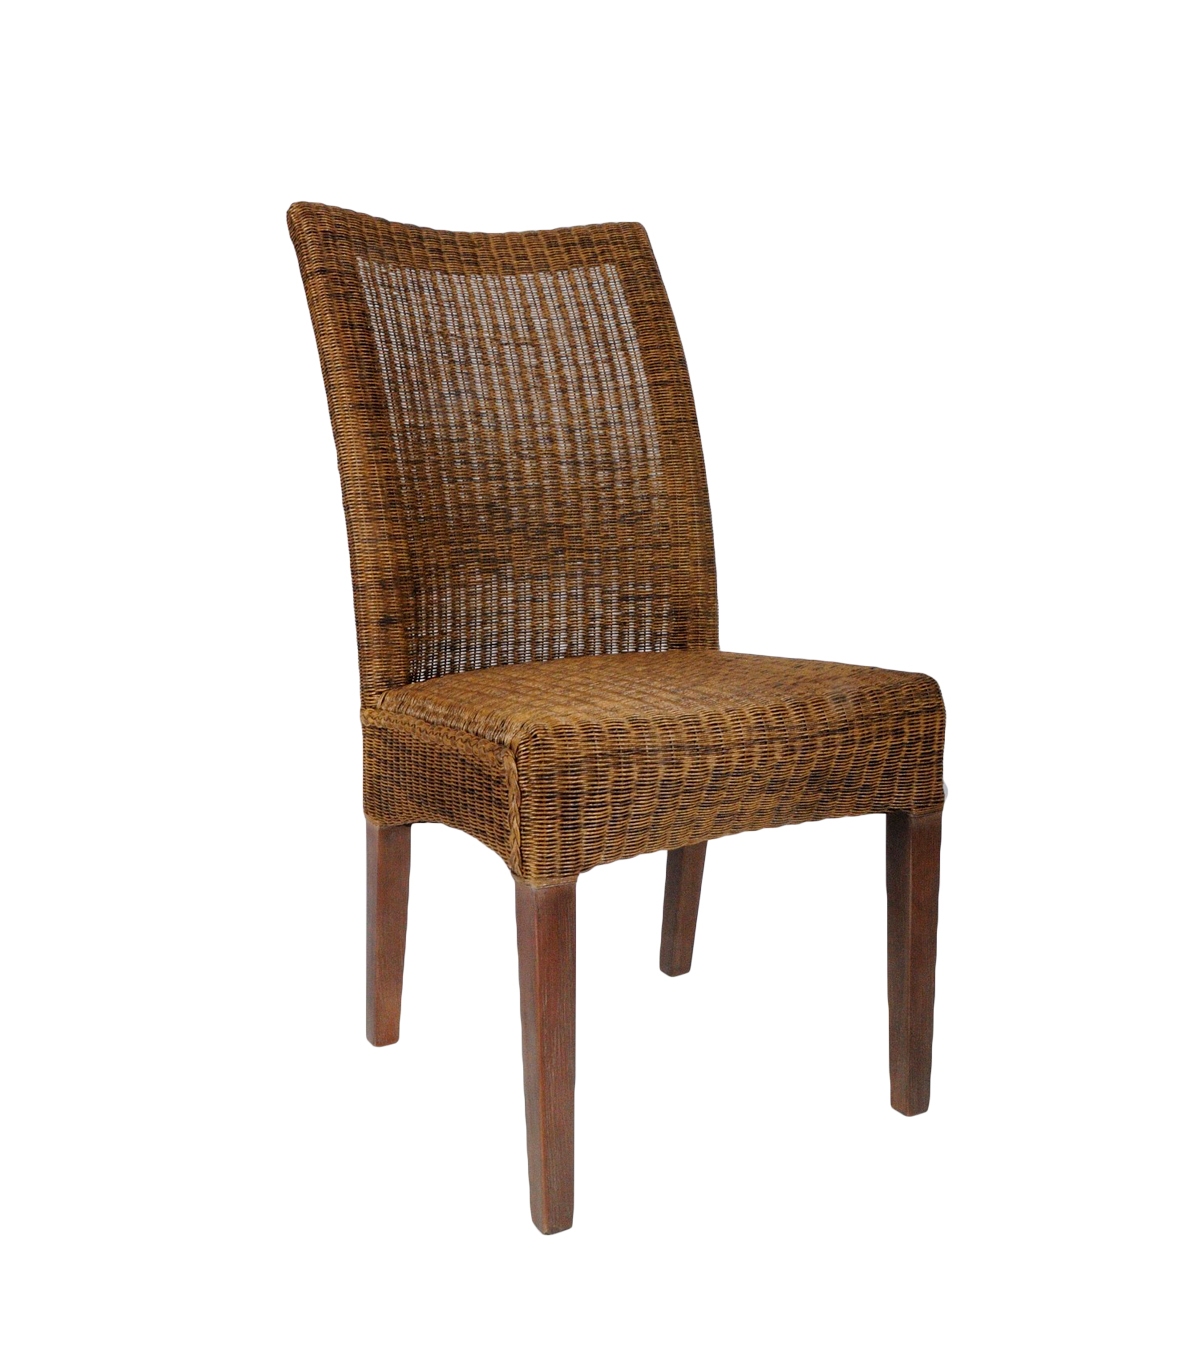 mixed loom stuhl cambridge braun lloydloomshop24. Black Bedroom Furniture Sets. Home Design Ideas